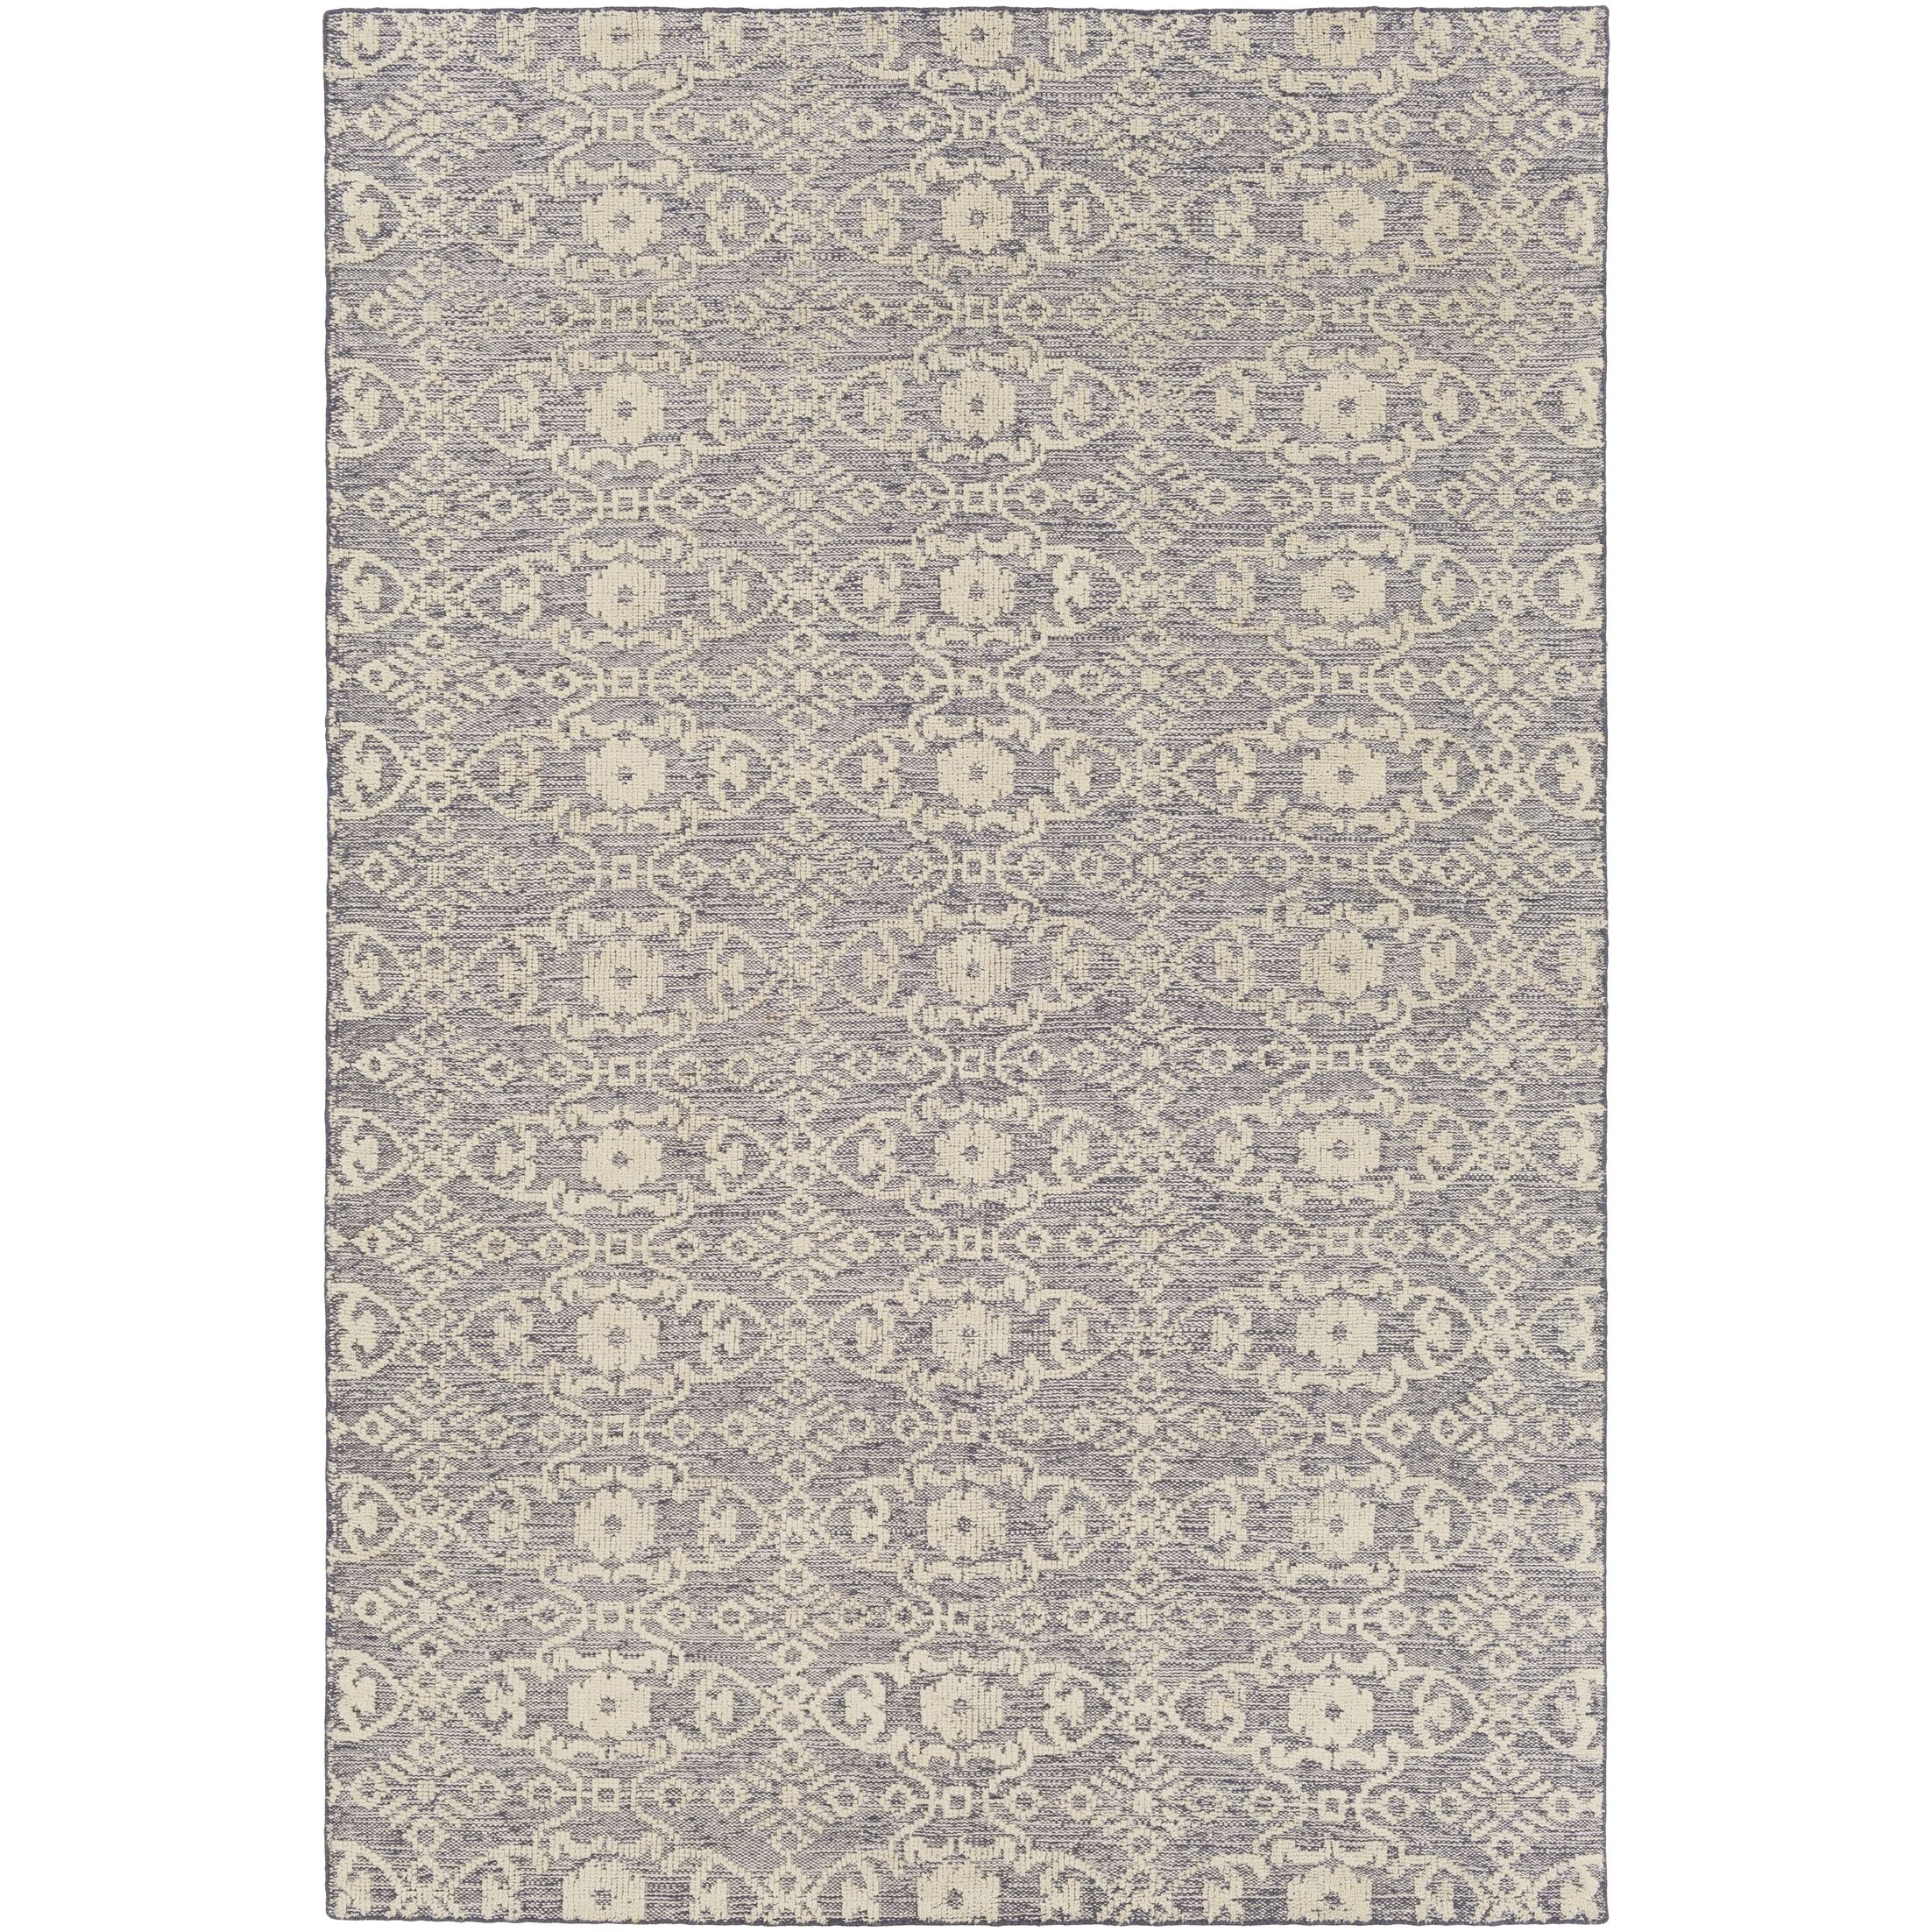 Eramana Hand Hooked Gray/Beige Area Rug Rug Size: Rectangle 9' x 13'